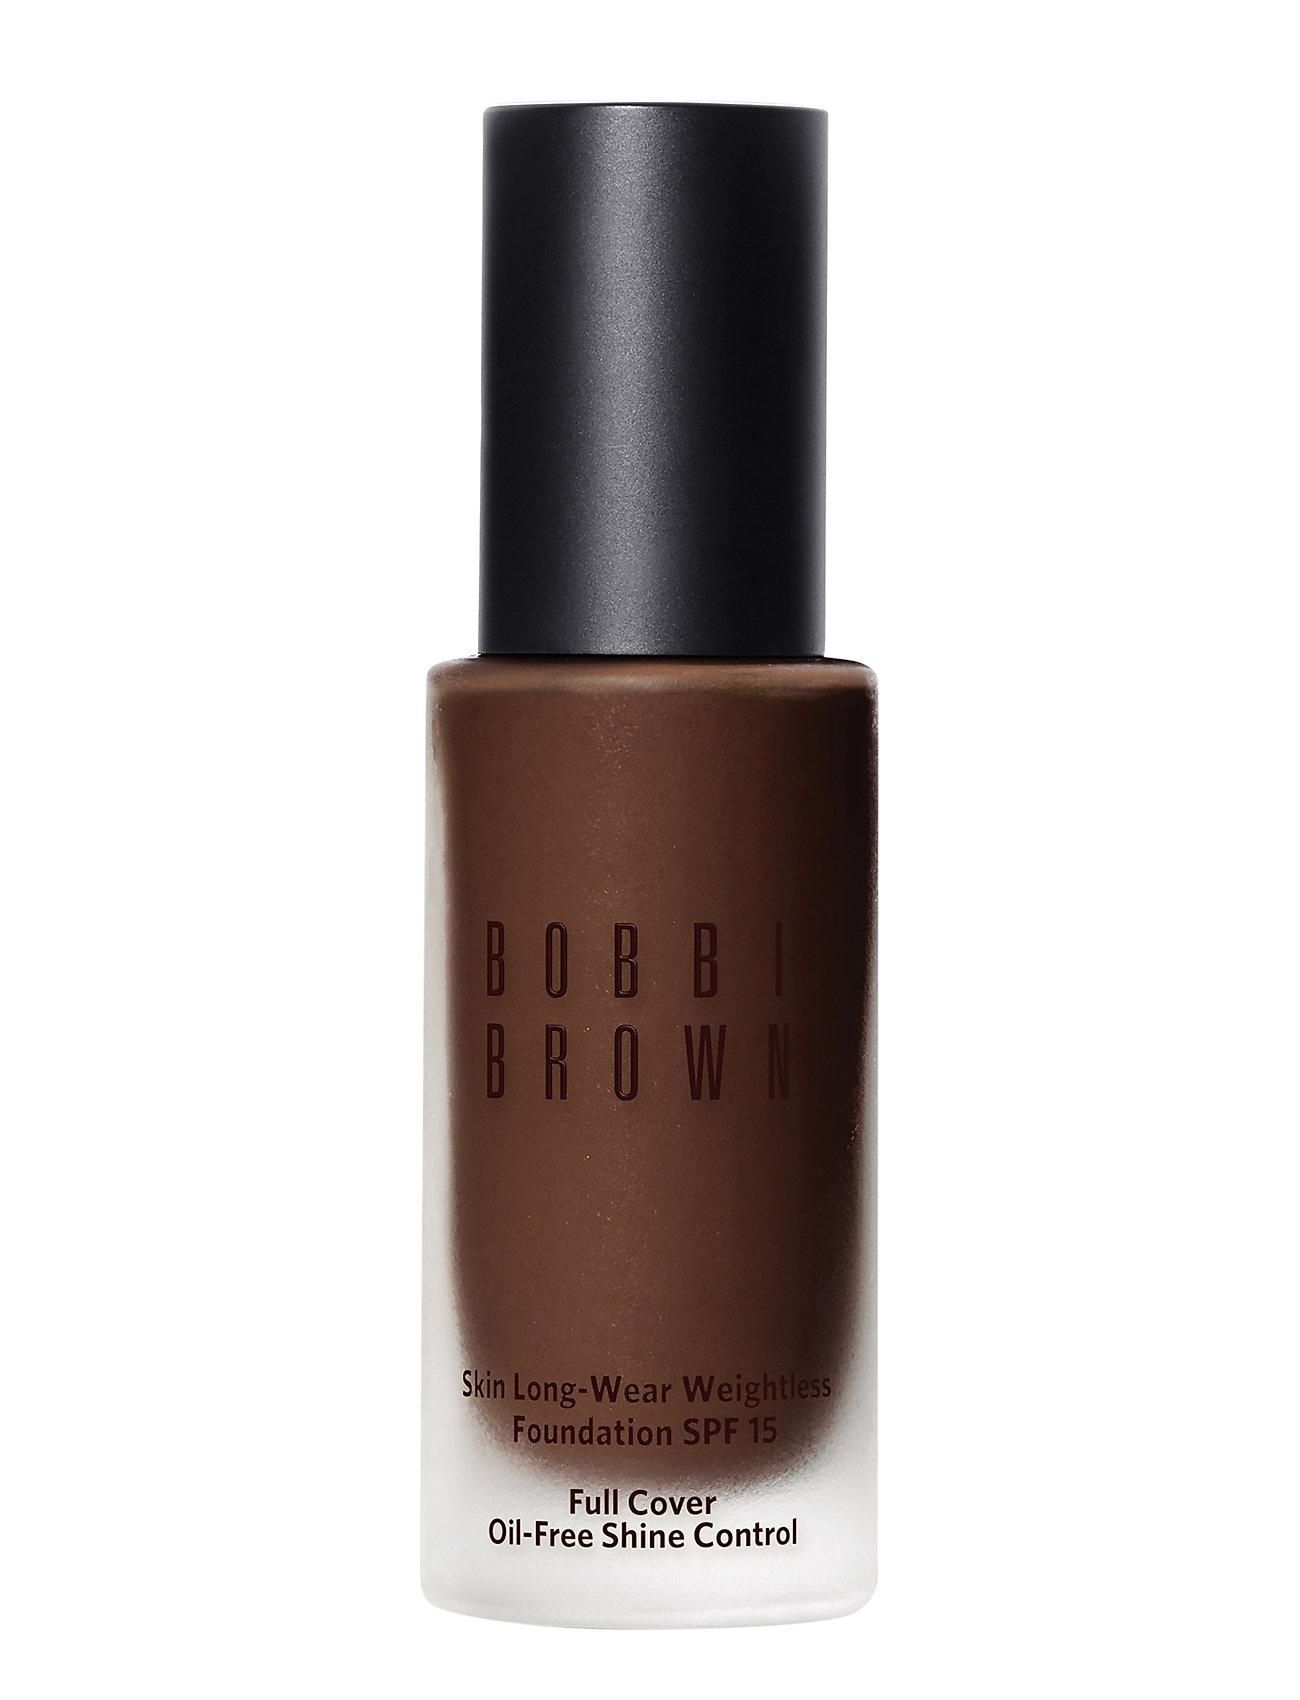 Image of Skin Long-Wear Weightless Foundation Spf 15, Cool Chestnut, Foundation Makeup Bobbi Brown (3442084493)